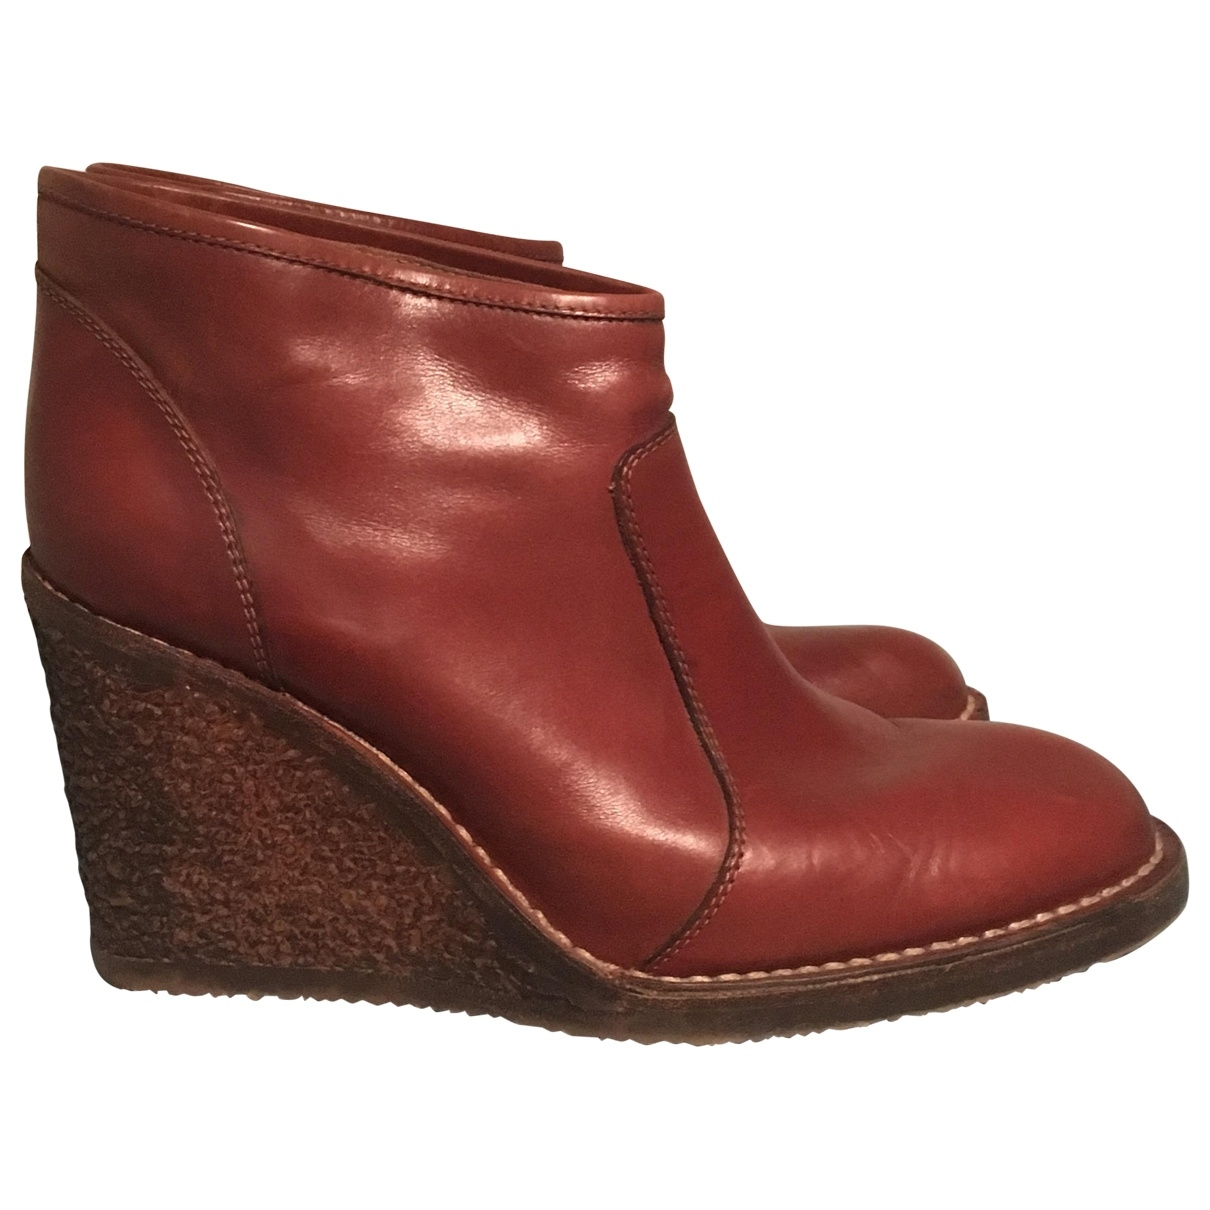 Maison Martin Margiela \N Burgundy Leather Ankle boots for Women 40 EU